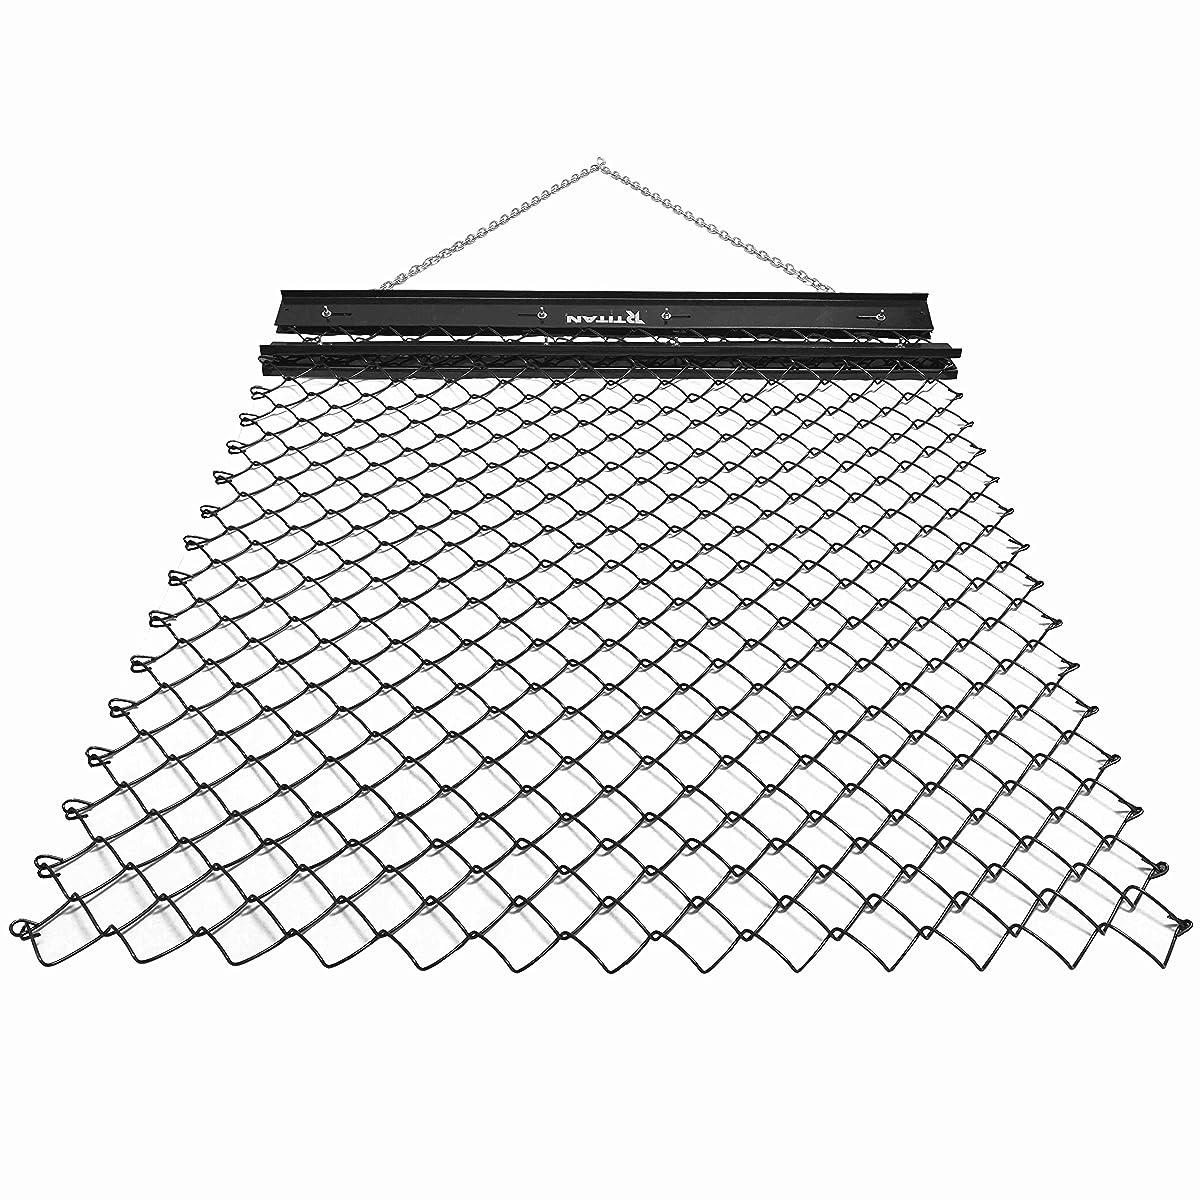 Titan 4 x 5 Drag Harrow Grading Leveling Drag Mat Steel Mesh